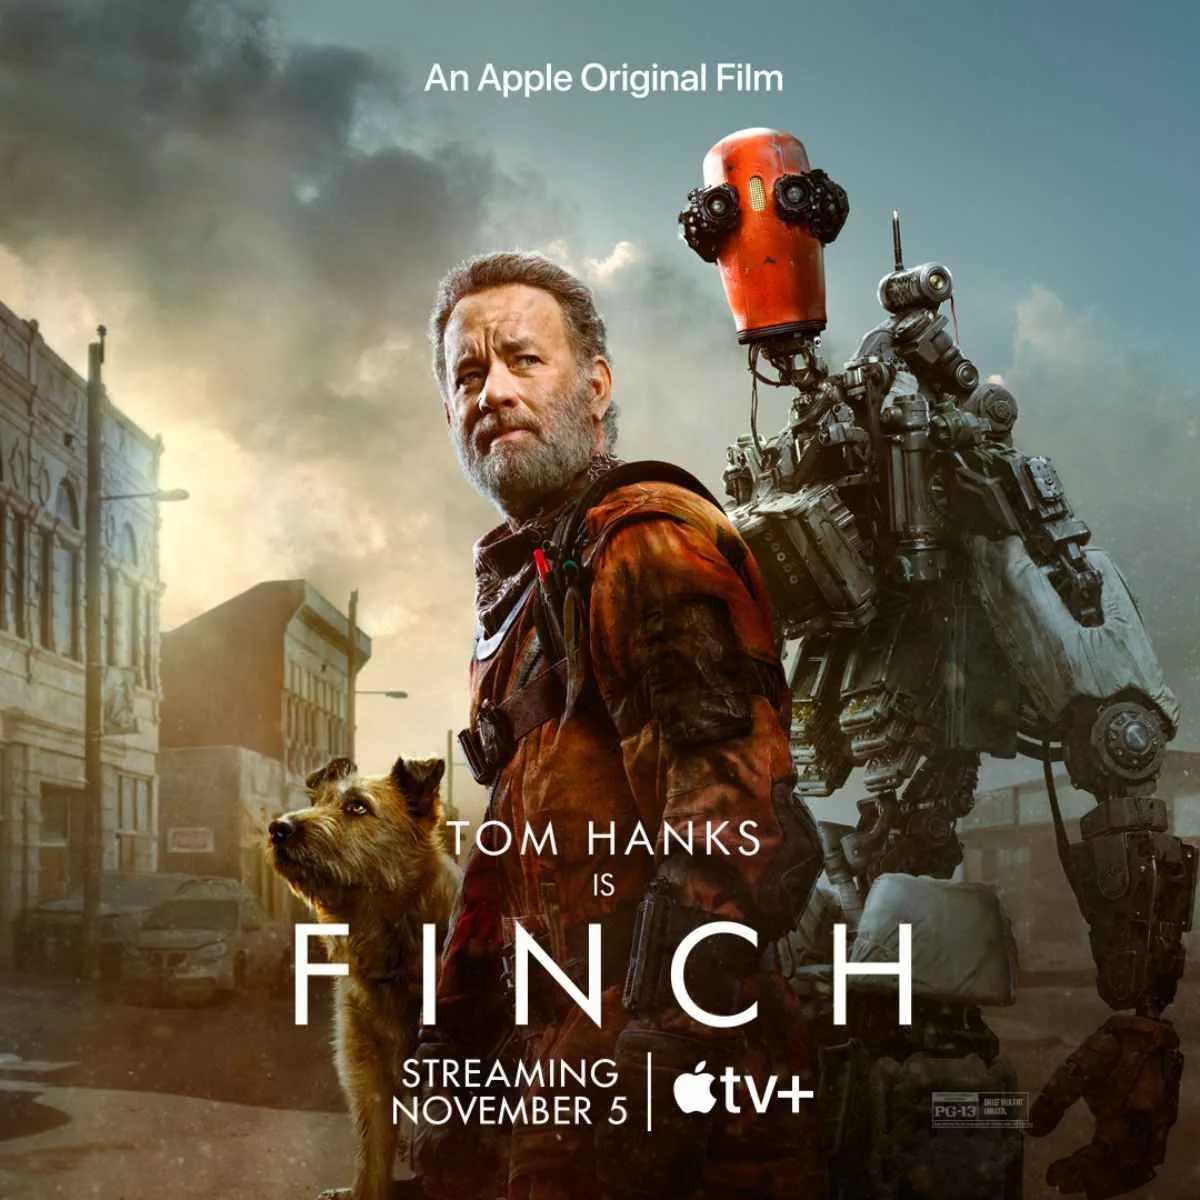 Finch Trailer